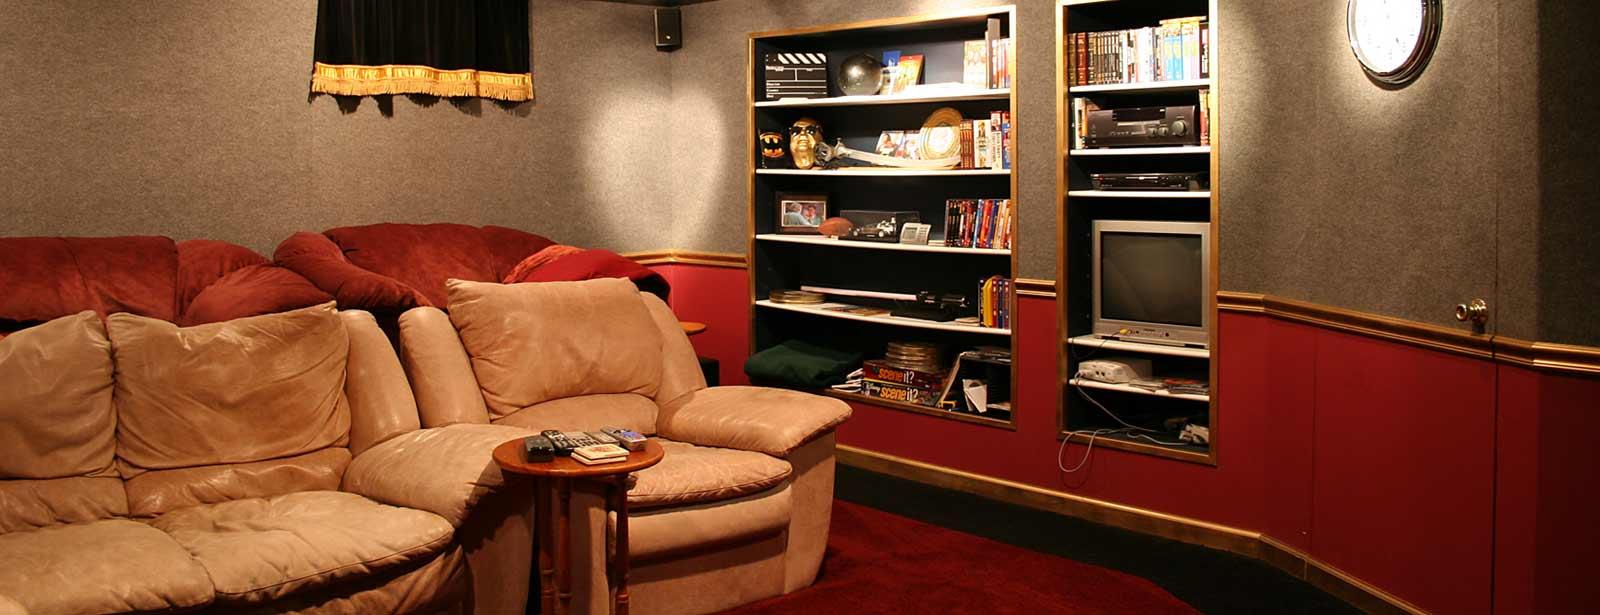 Enjoyable Rooms For Rent International Student House Saras Homestay Interior Design Ideas Gentotryabchikinfo